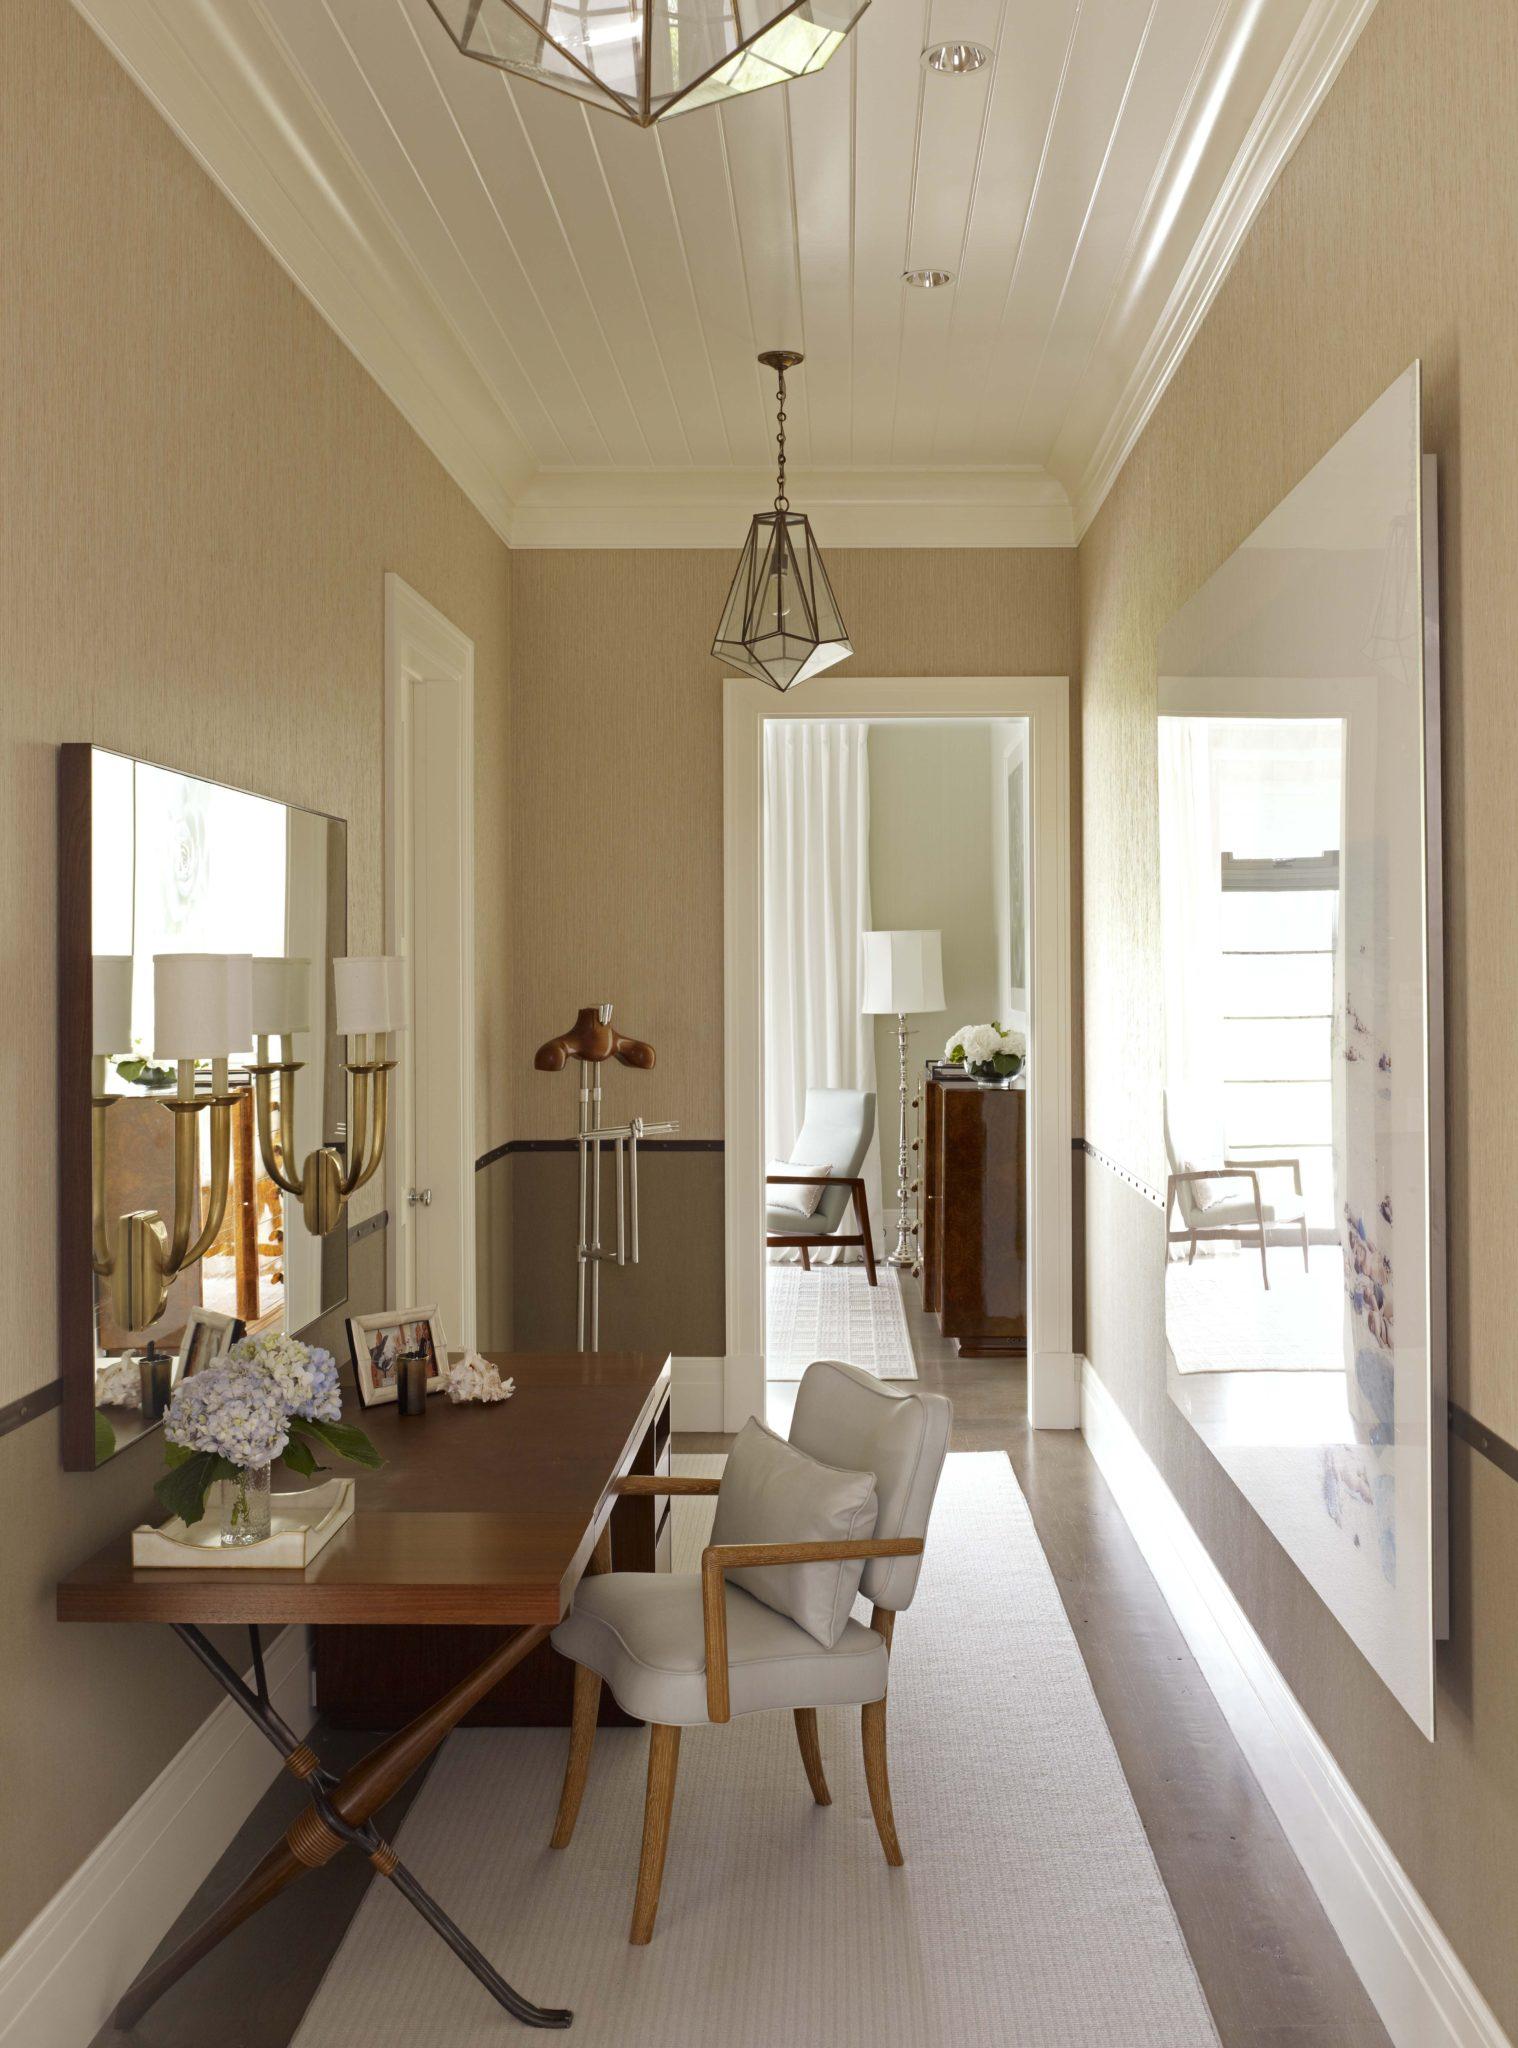 Bridgehampton Residence, Guest Master Bedroom Dressing Room by Stephens Design Group